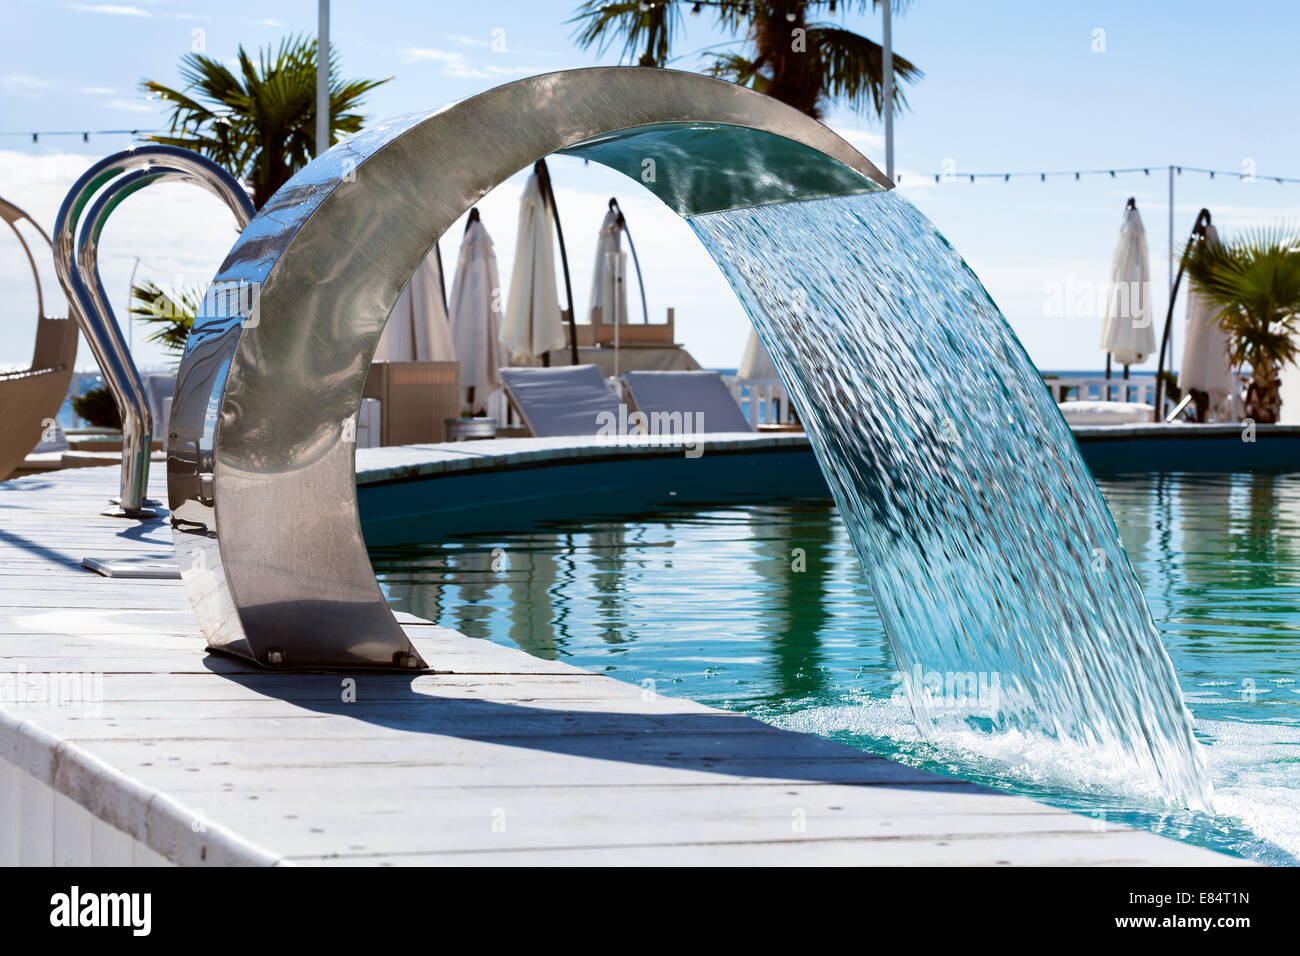 waterfall jet swimming pool - Stock Image